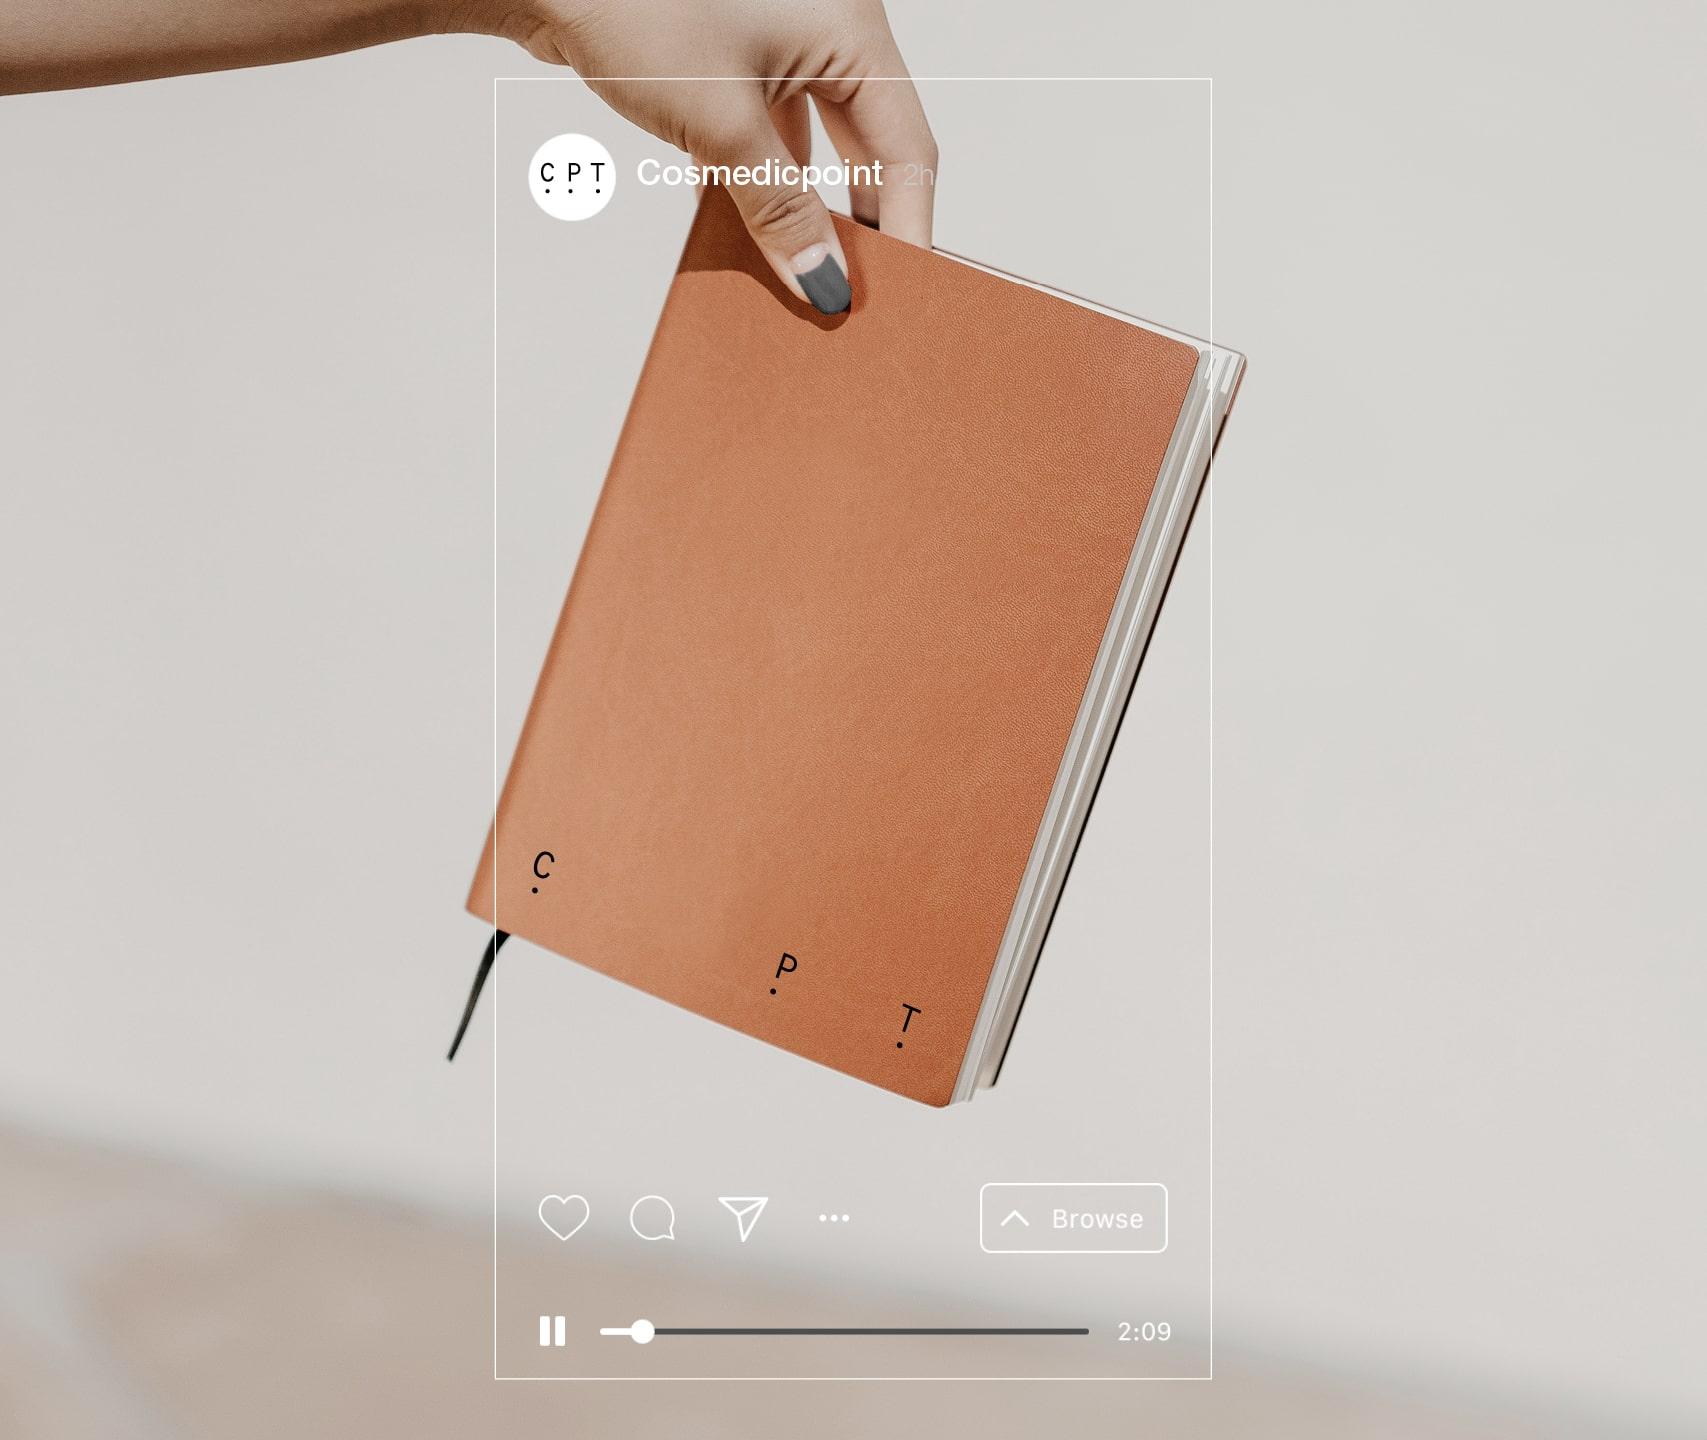 mantik-digital-branding-development-agency-chocolate-packaging-webdesign-design-38-min